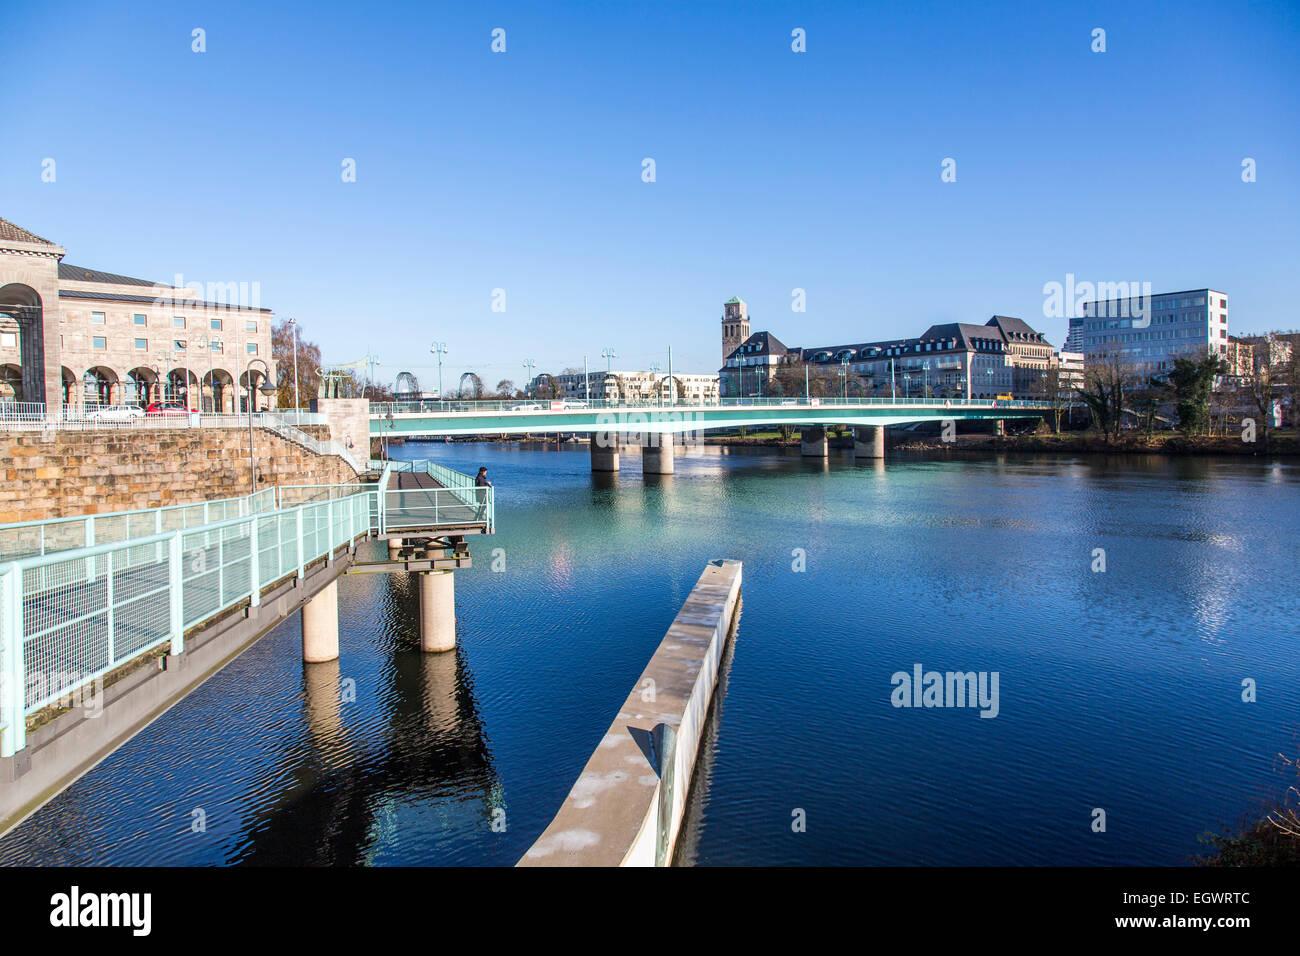 City center, Mülheim, river Ruhr, bridges, - Stock Image